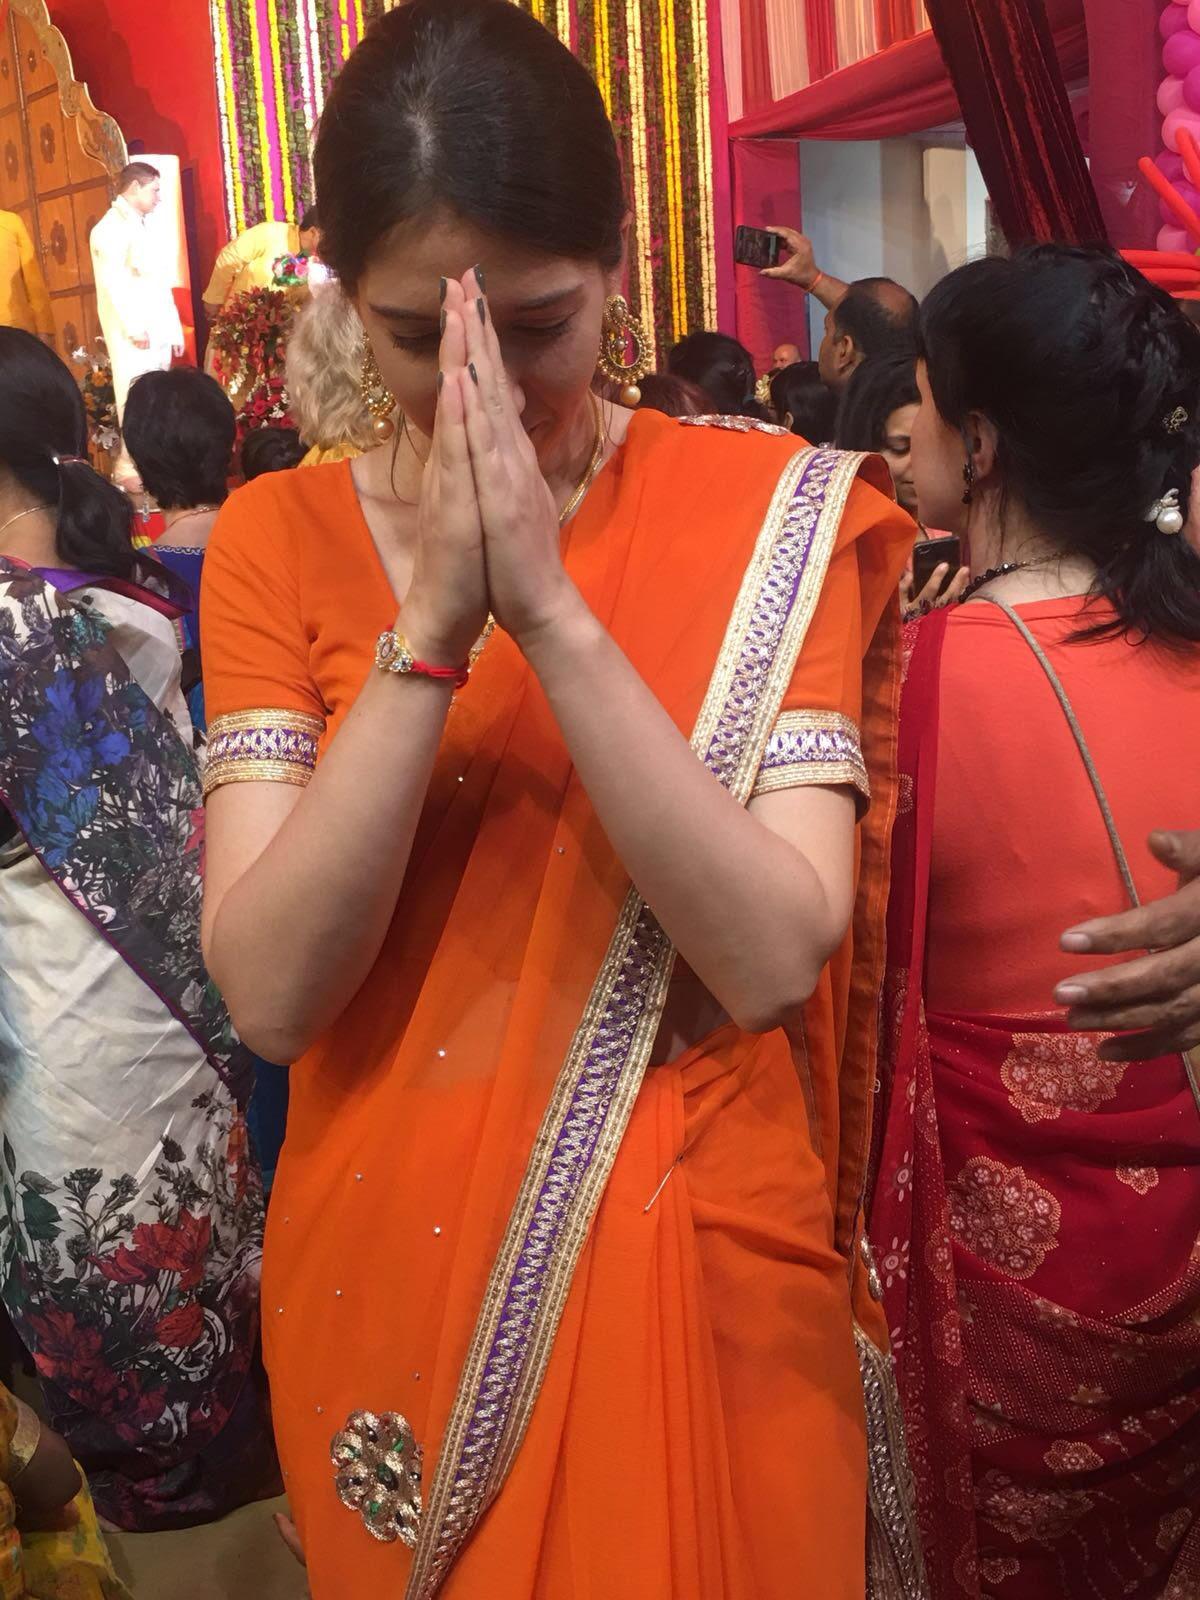 hindistan dinleri - hindistan gezi rehberi